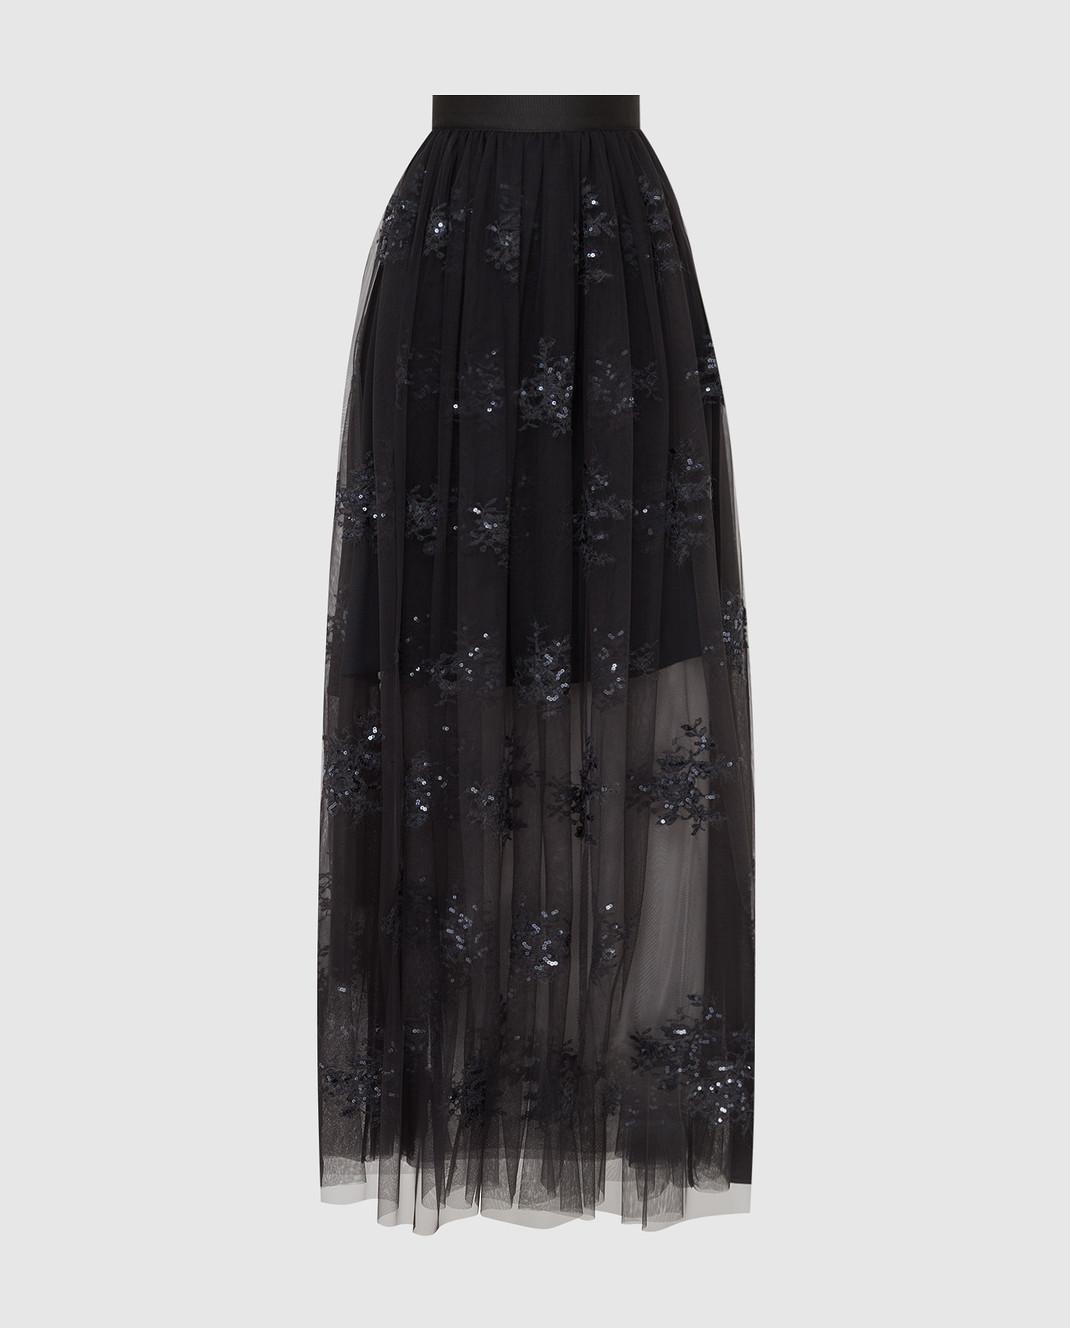 Brunello Cucinelli Темно-серая юбка MA960G2739